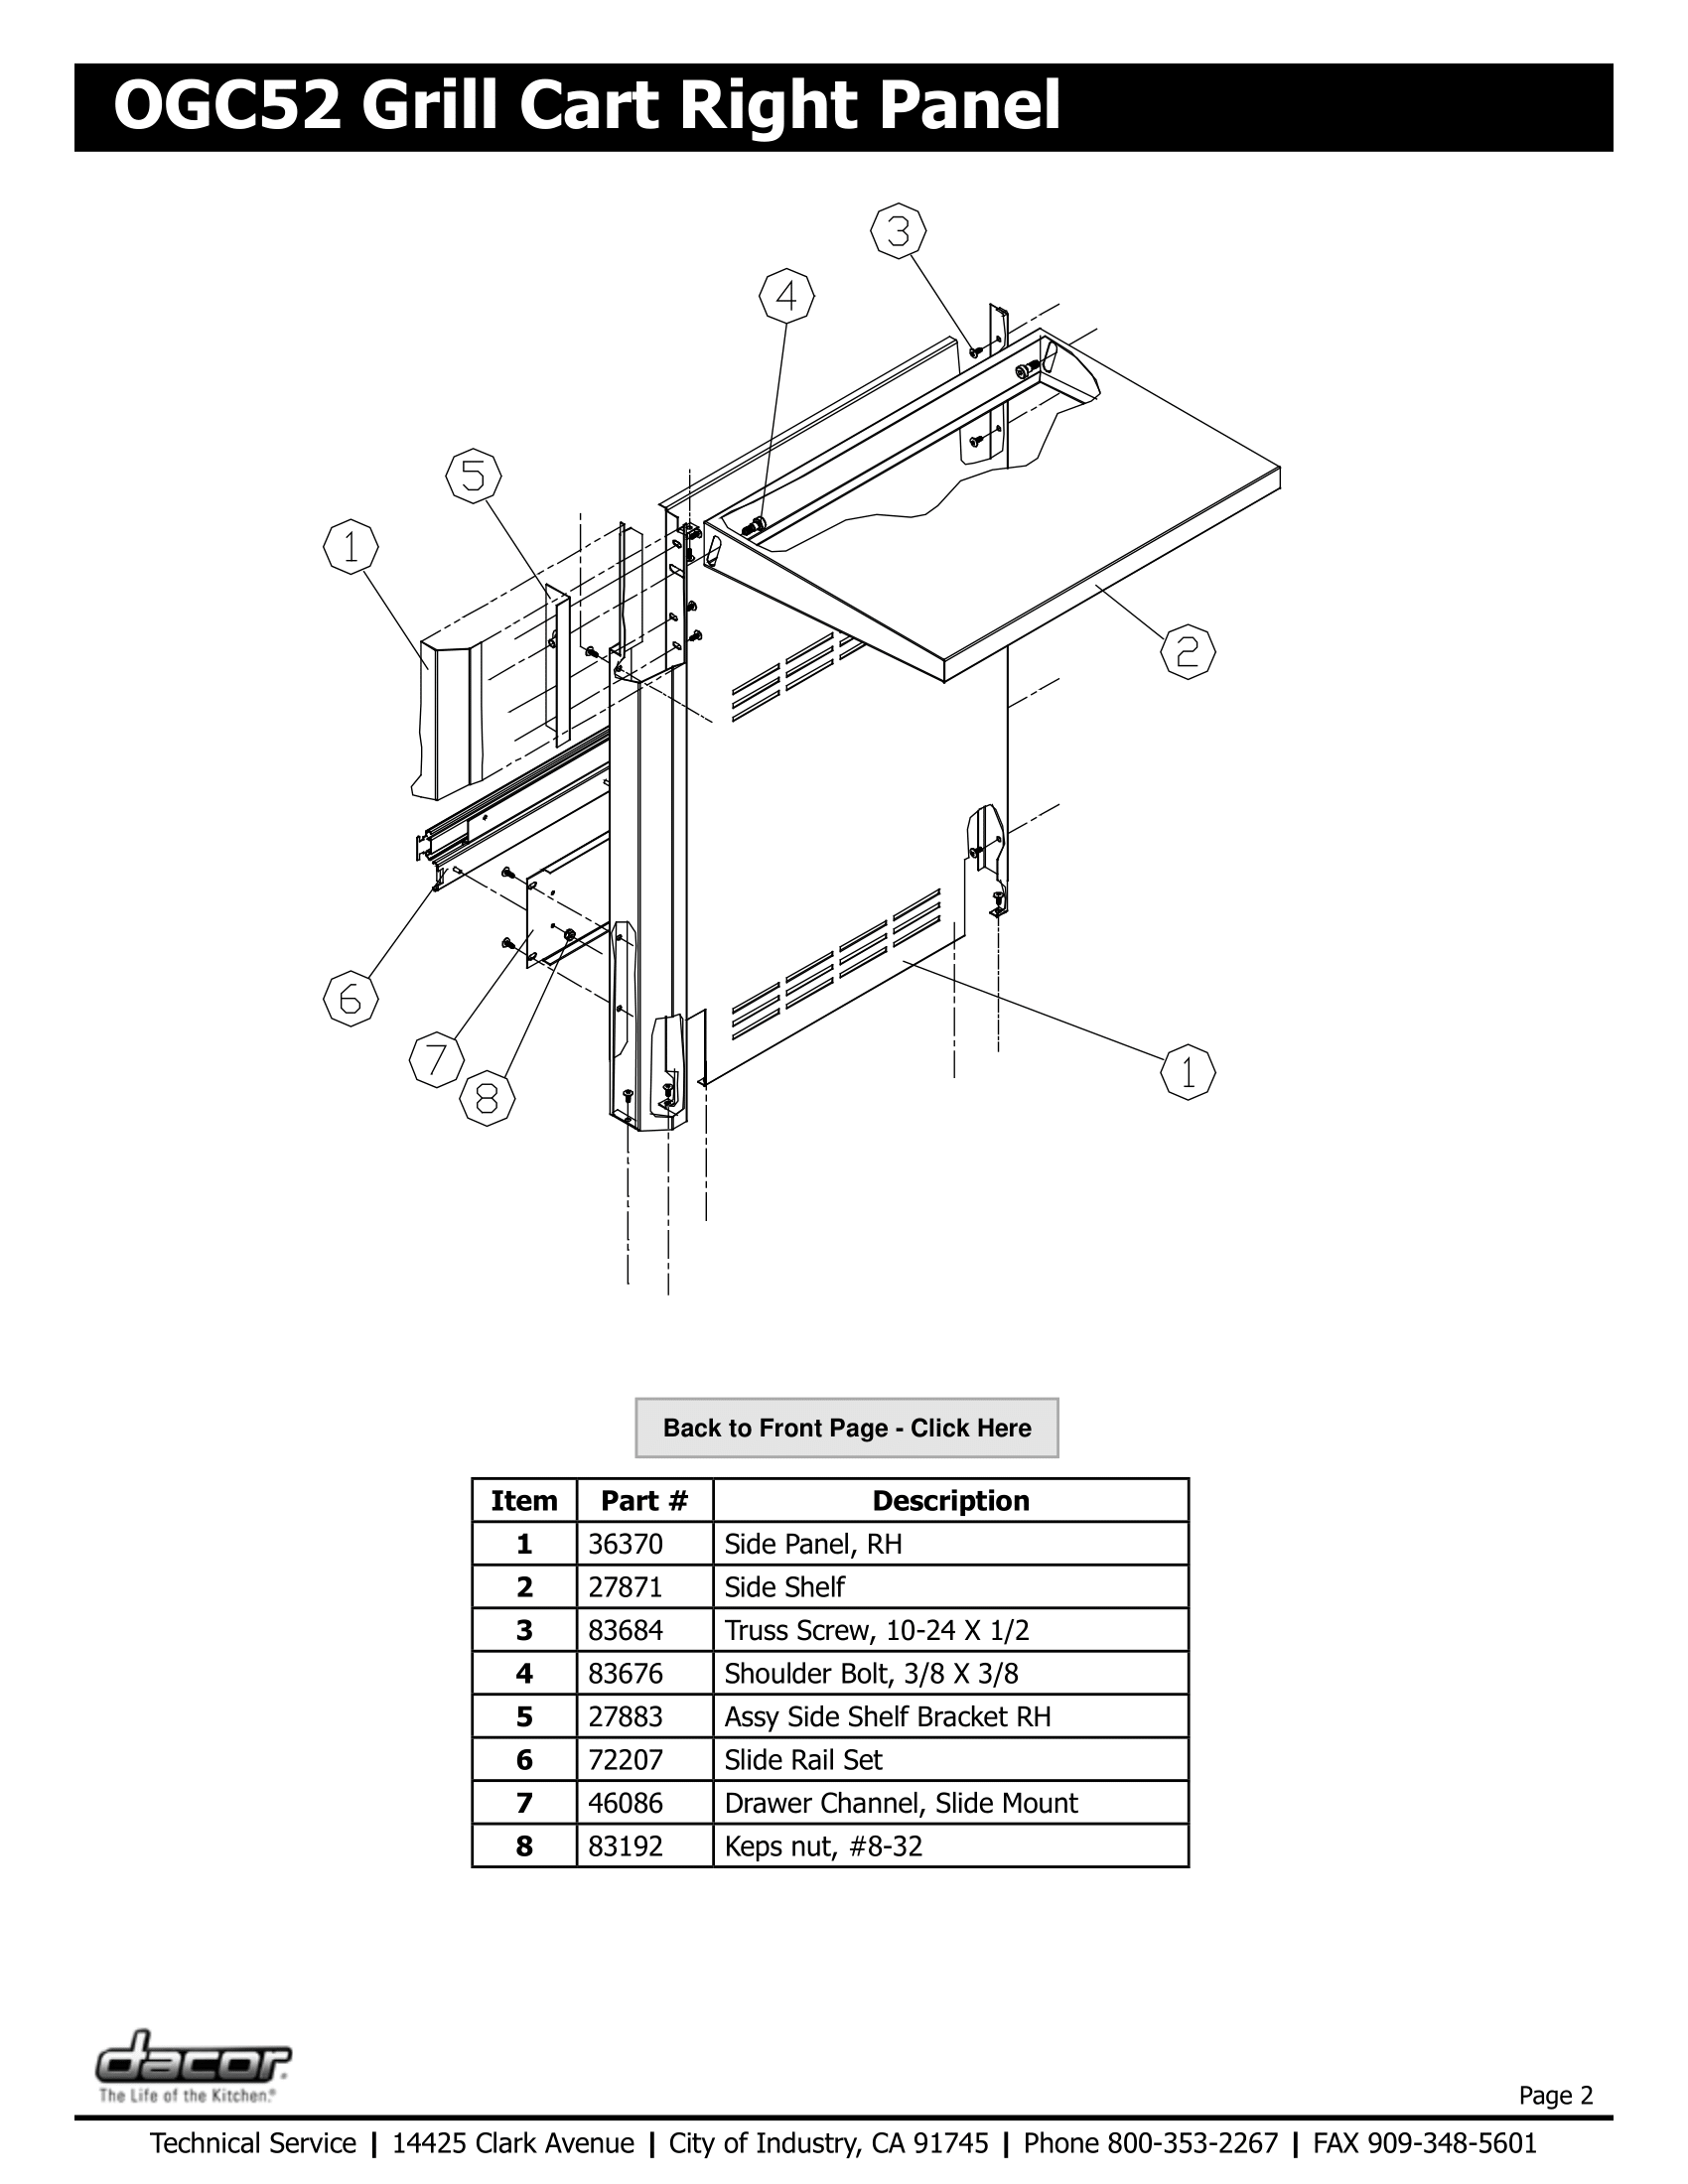 Dacor OGC52 Right Panel Schematic